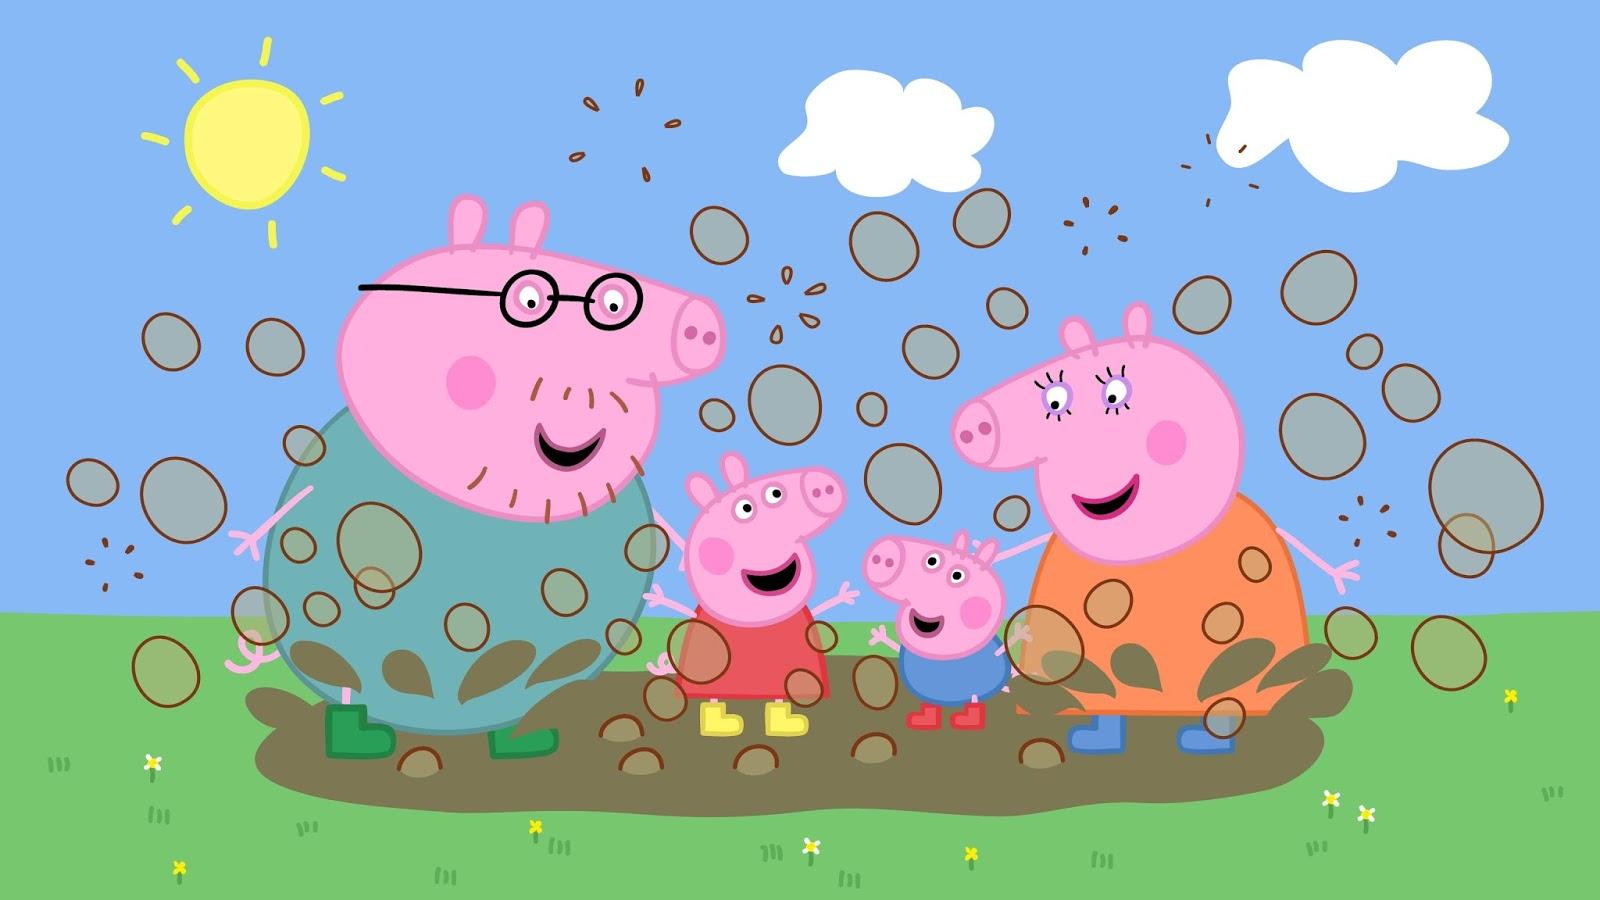 48 peppa pig hd wallpaper on wallpapersafari - Pig wallpaper cartoon pig ...